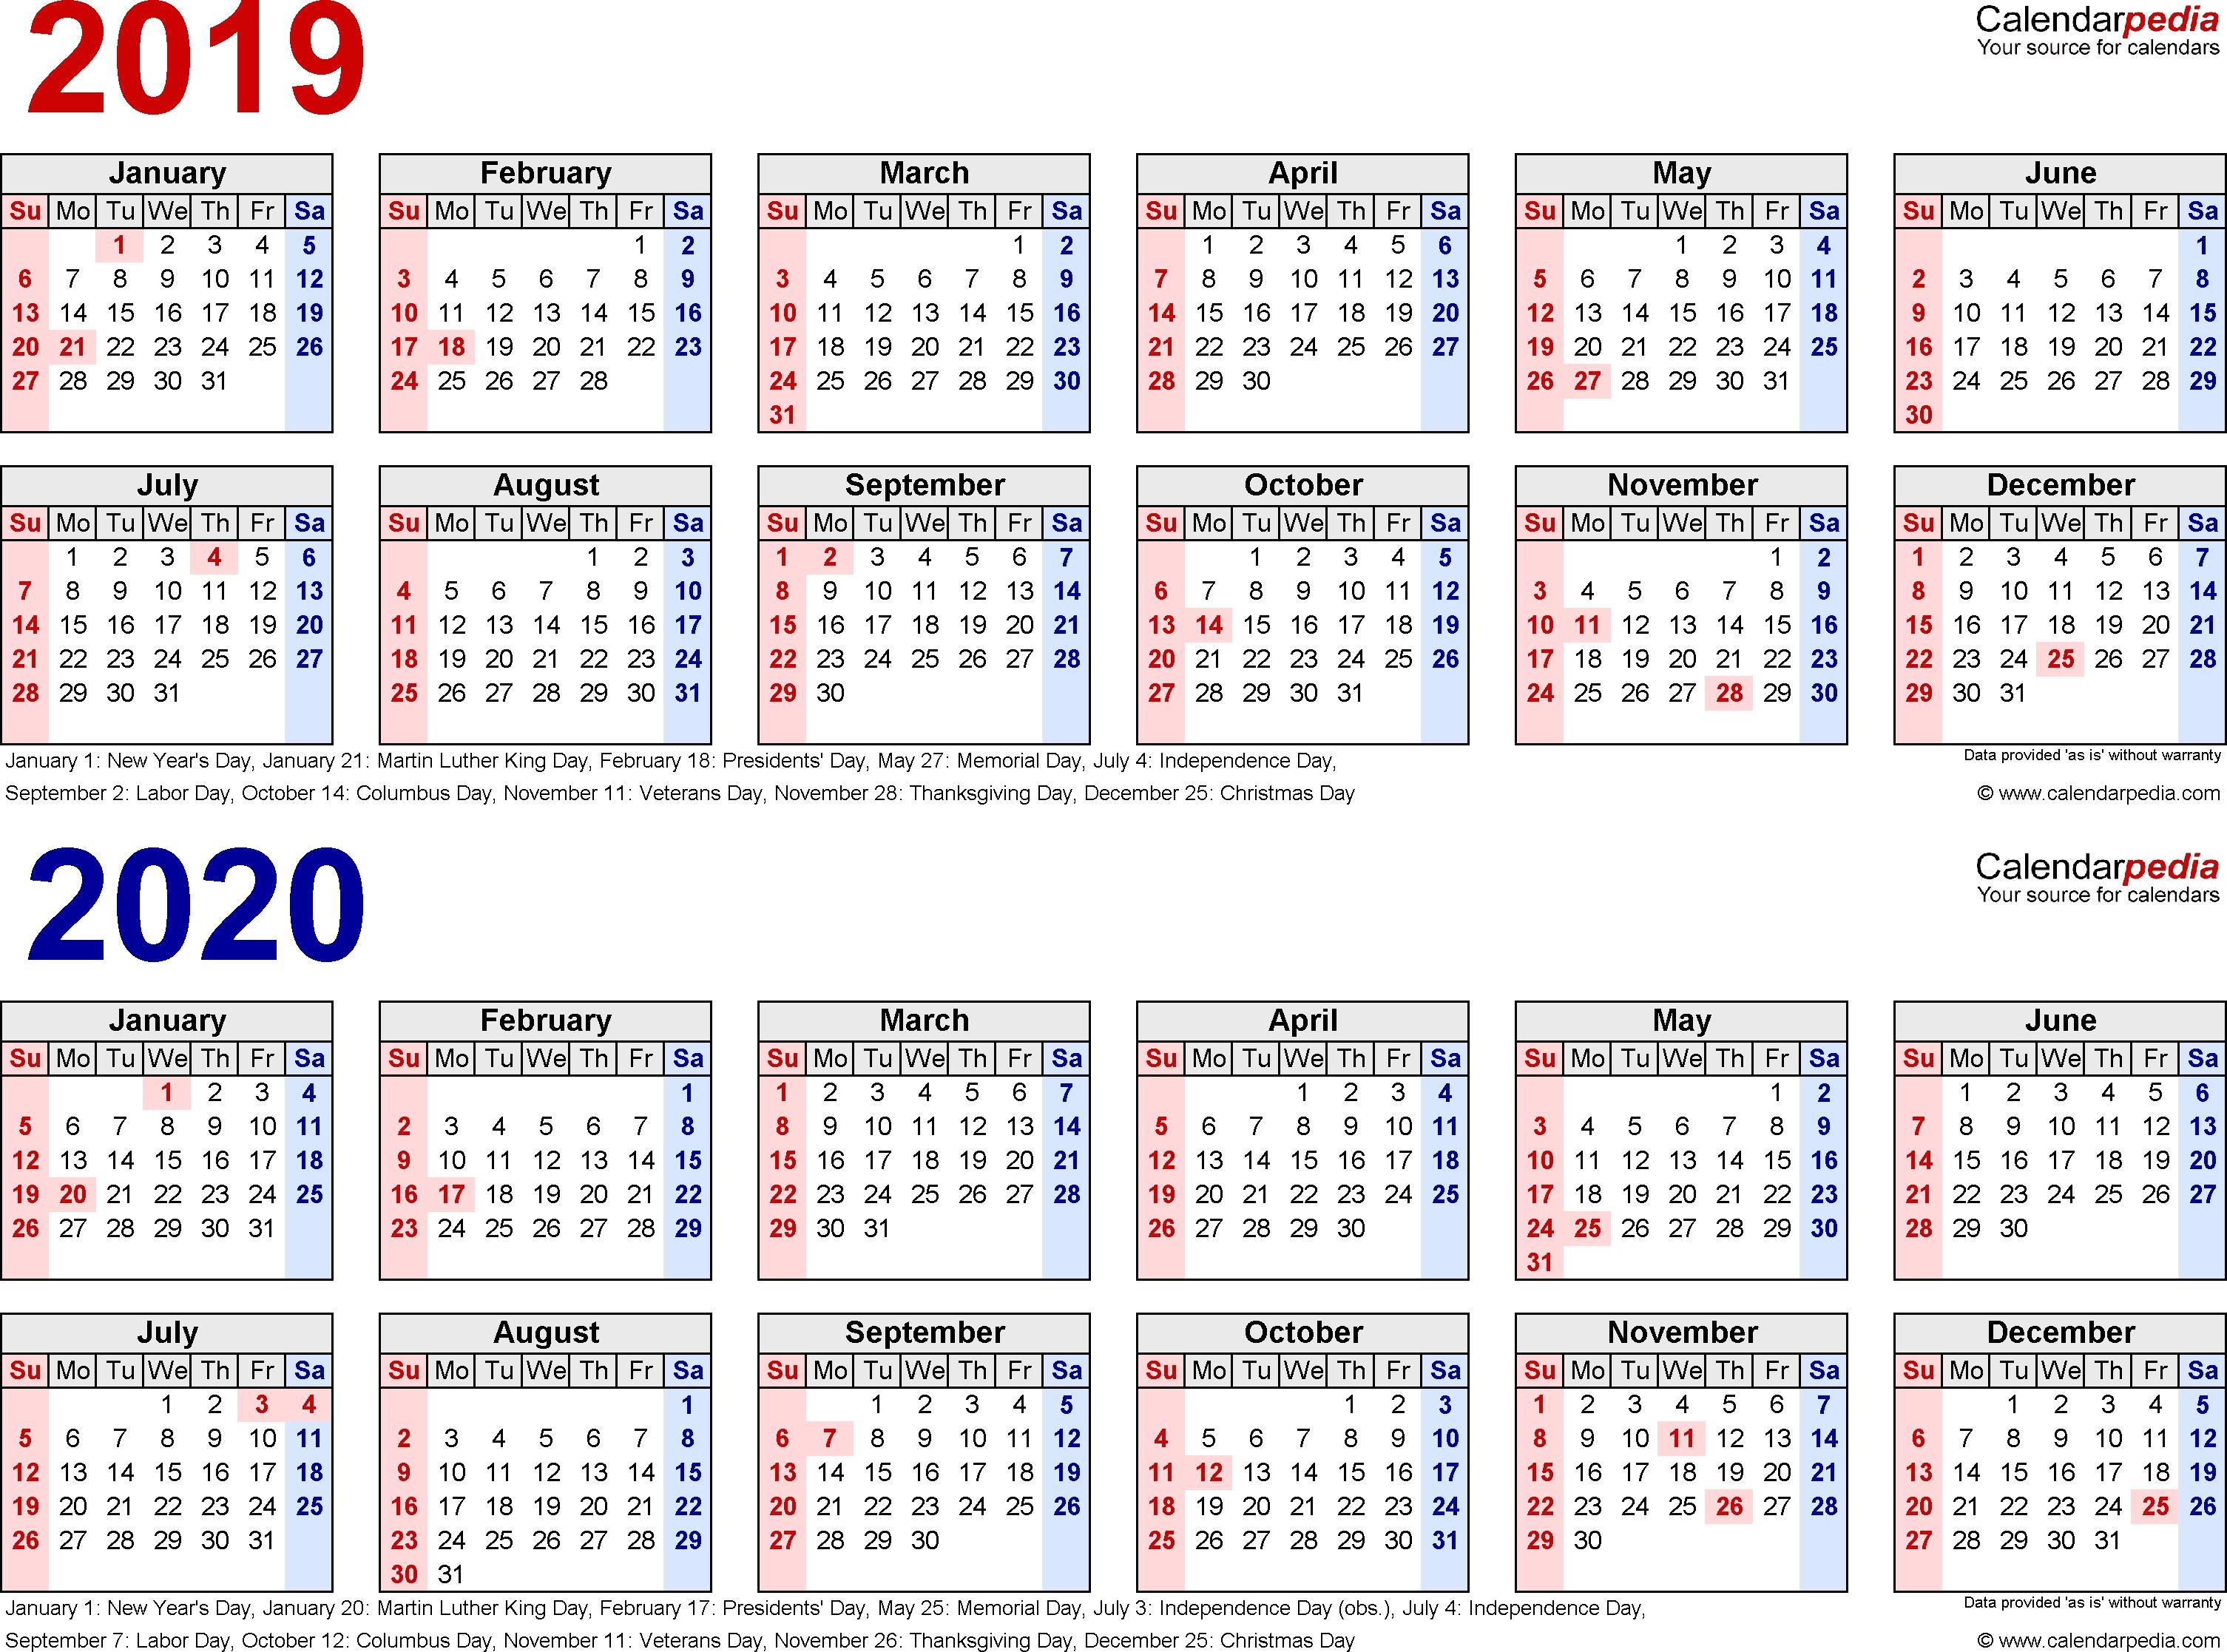 2019-2020 Calendar - Free Printable Two-Year Excel Calendars regarding Calendar 2019 2020 Xls